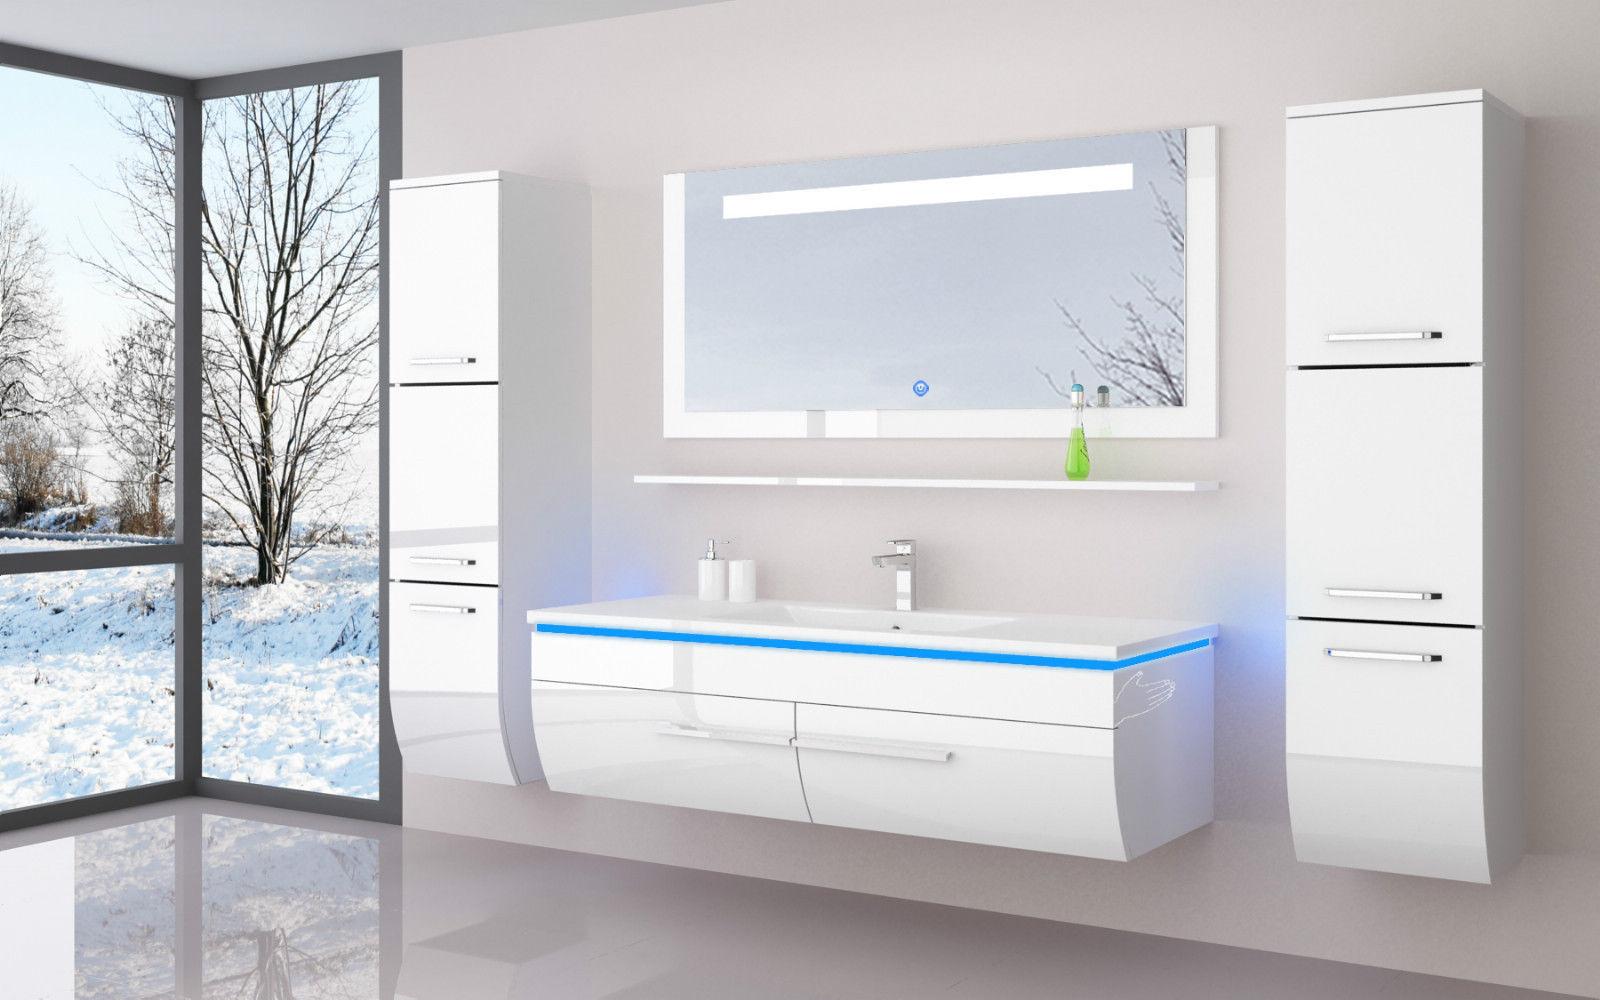 badezimmer m bel set wei hochglanz 120 cm 6teilig parim. Black Bedroom Furniture Sets. Home Design Ideas